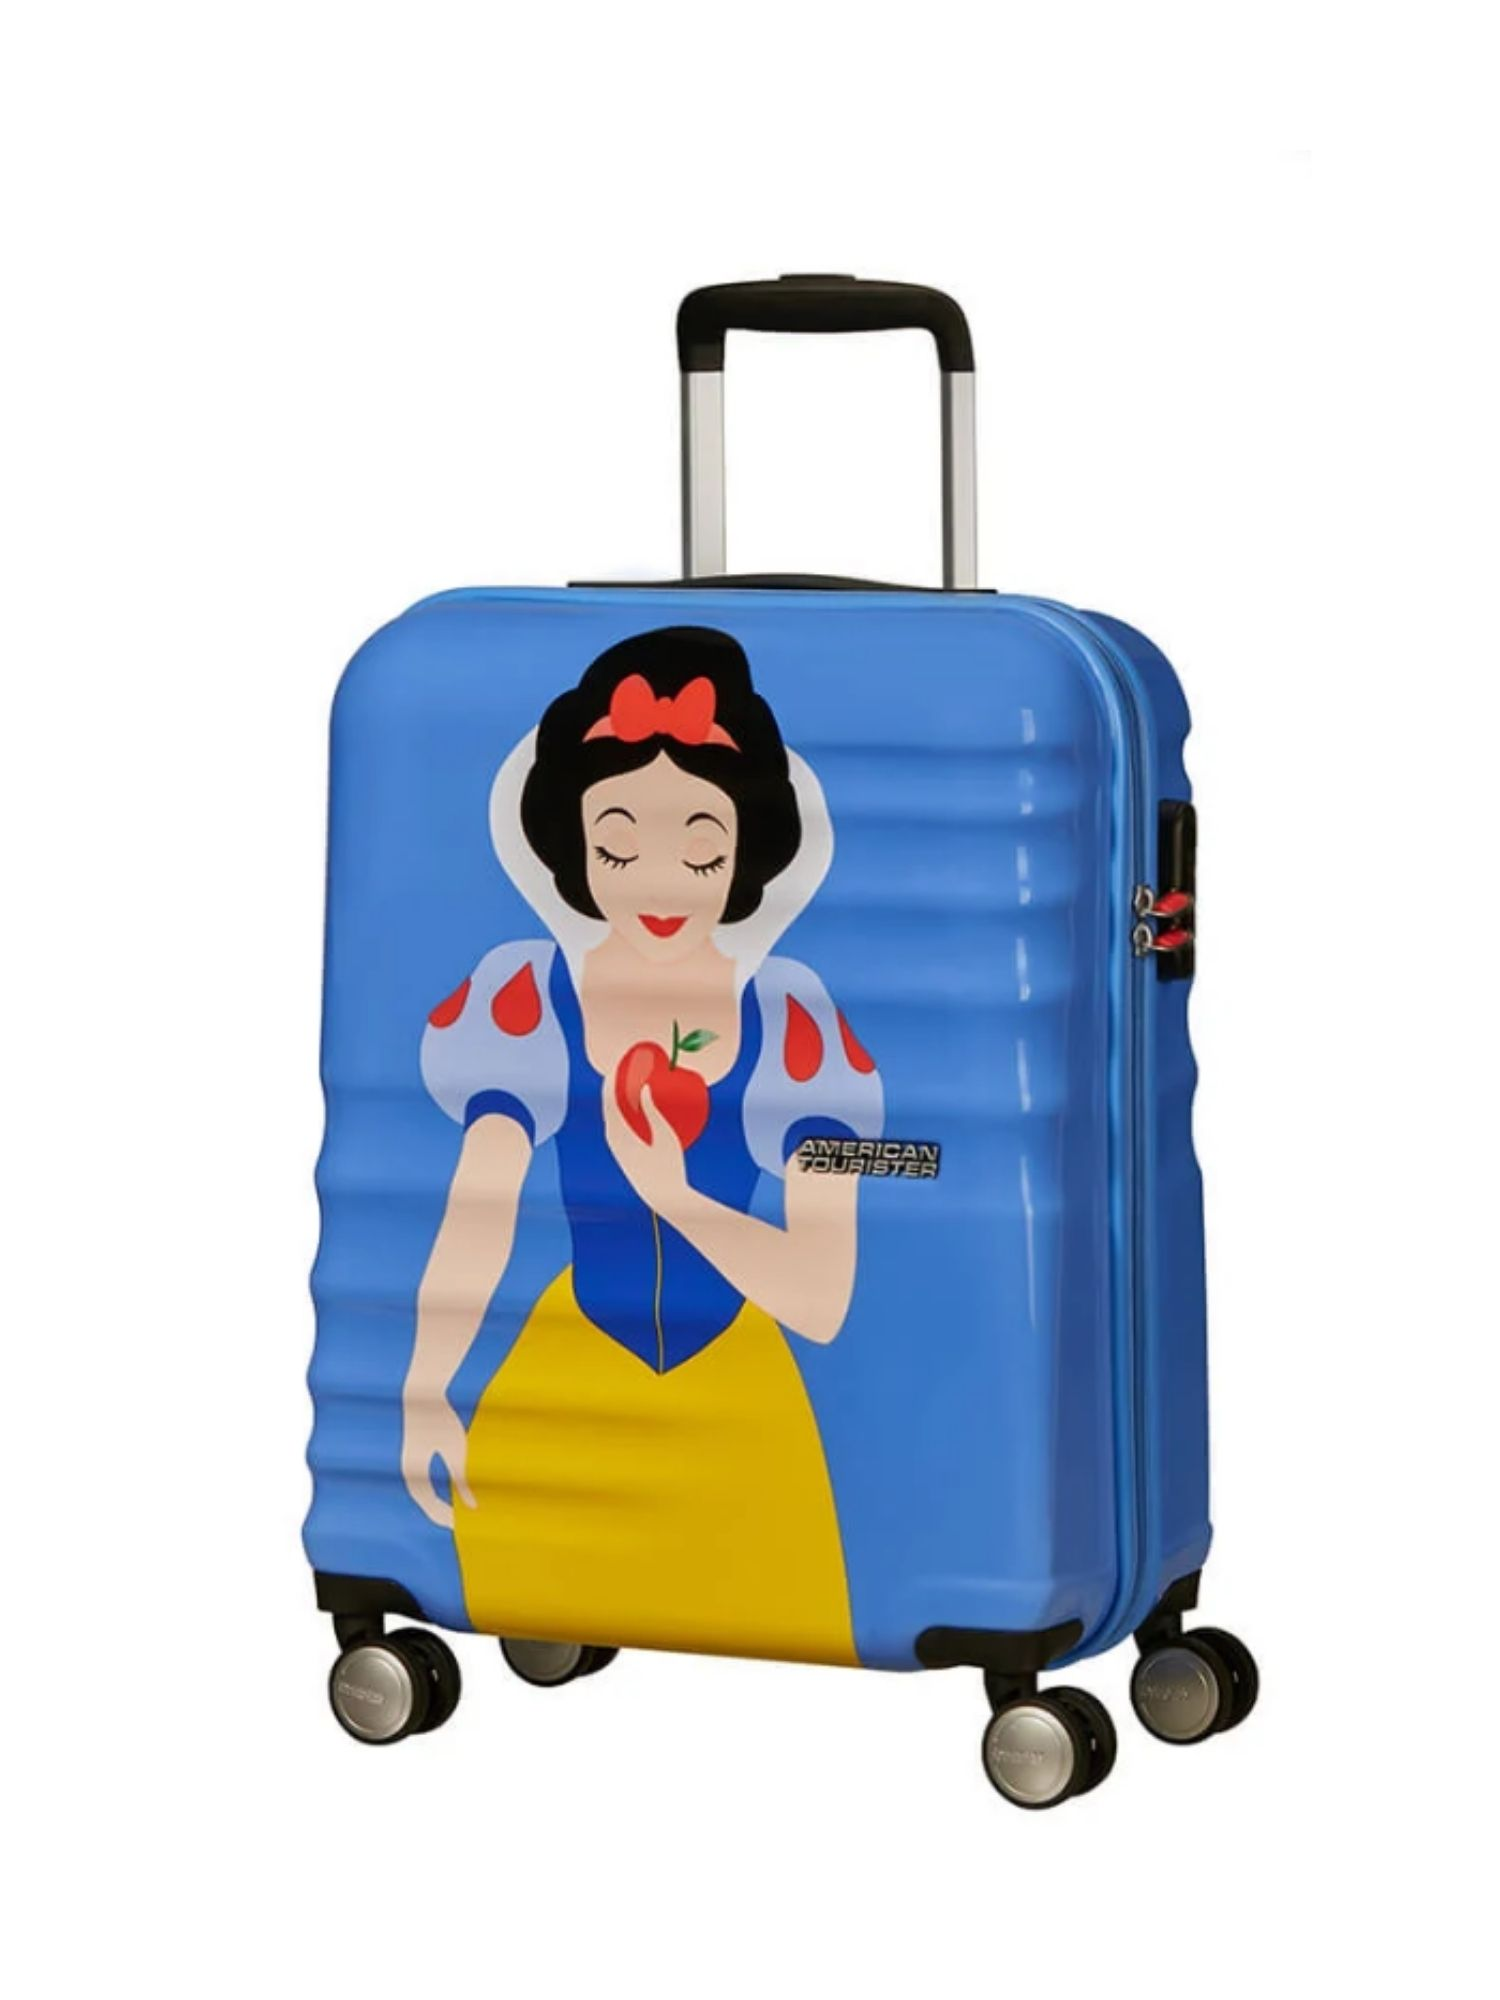 Trolley American Tourister 4 ruote 55 cm. Wavebreaker Disney Snow White